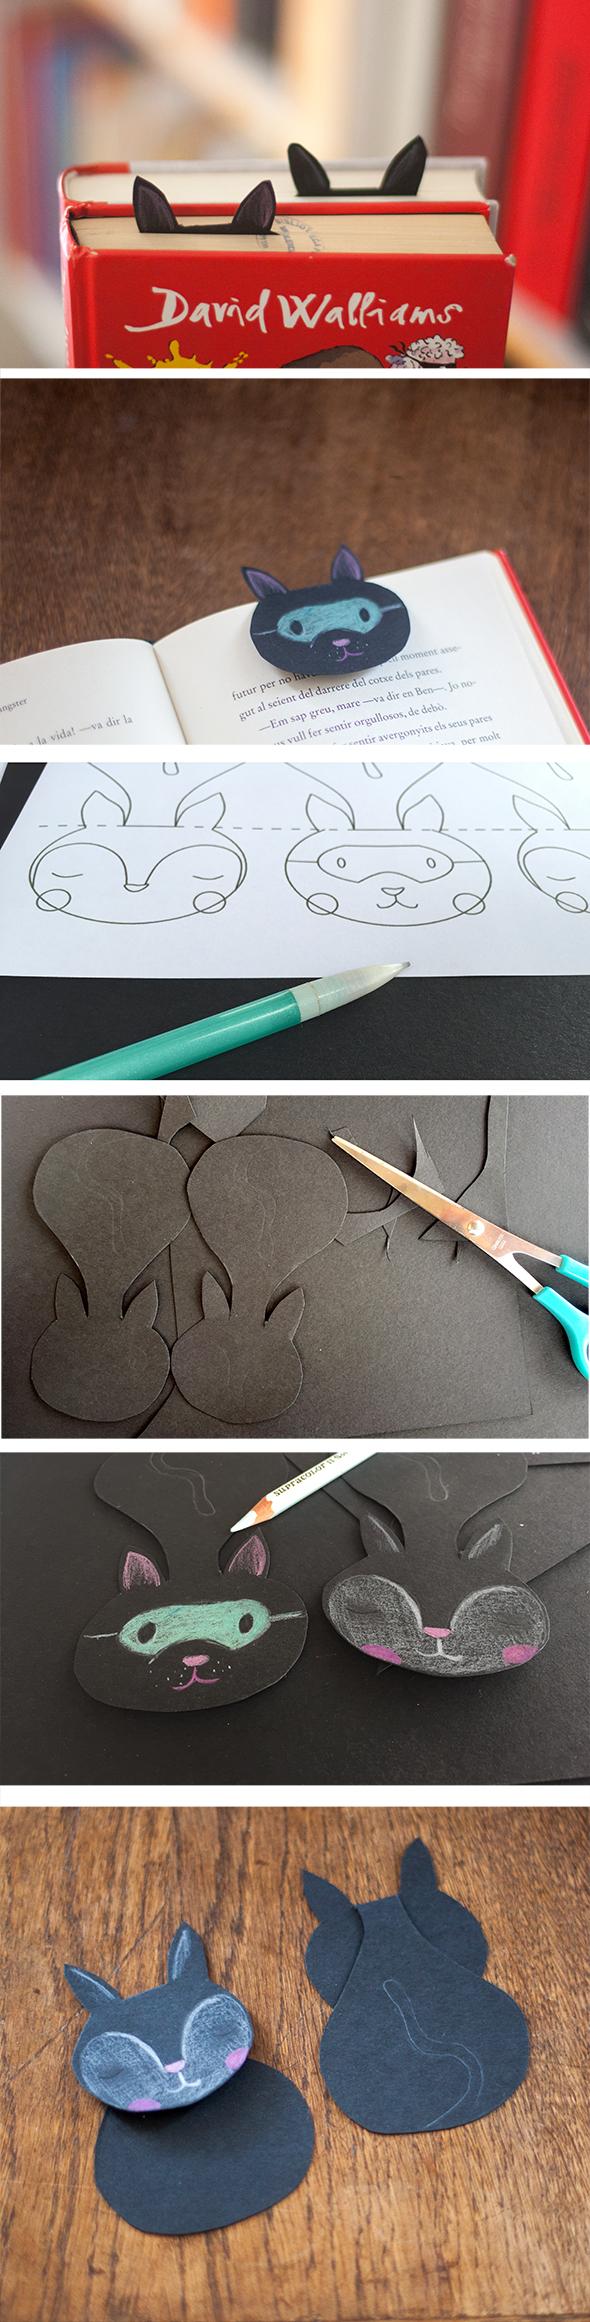 marcapaginas-halloween-lesezeichen-bookmark-katze-gato-cat-free-printable-druckvorlage-imprimible